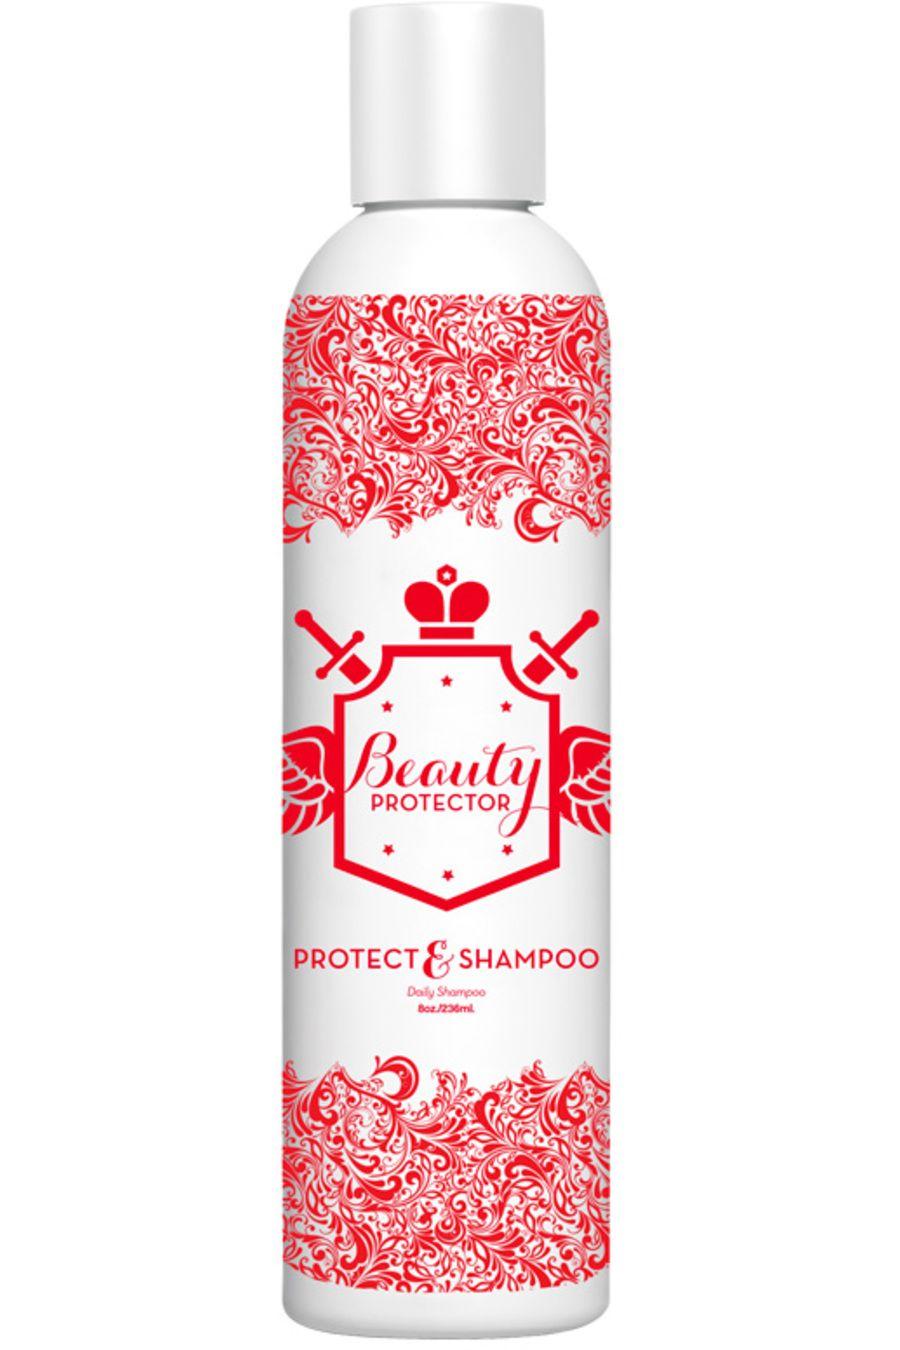 Blissim : Beauty Protector - Protect & Shampoo - Protect & Shampoo